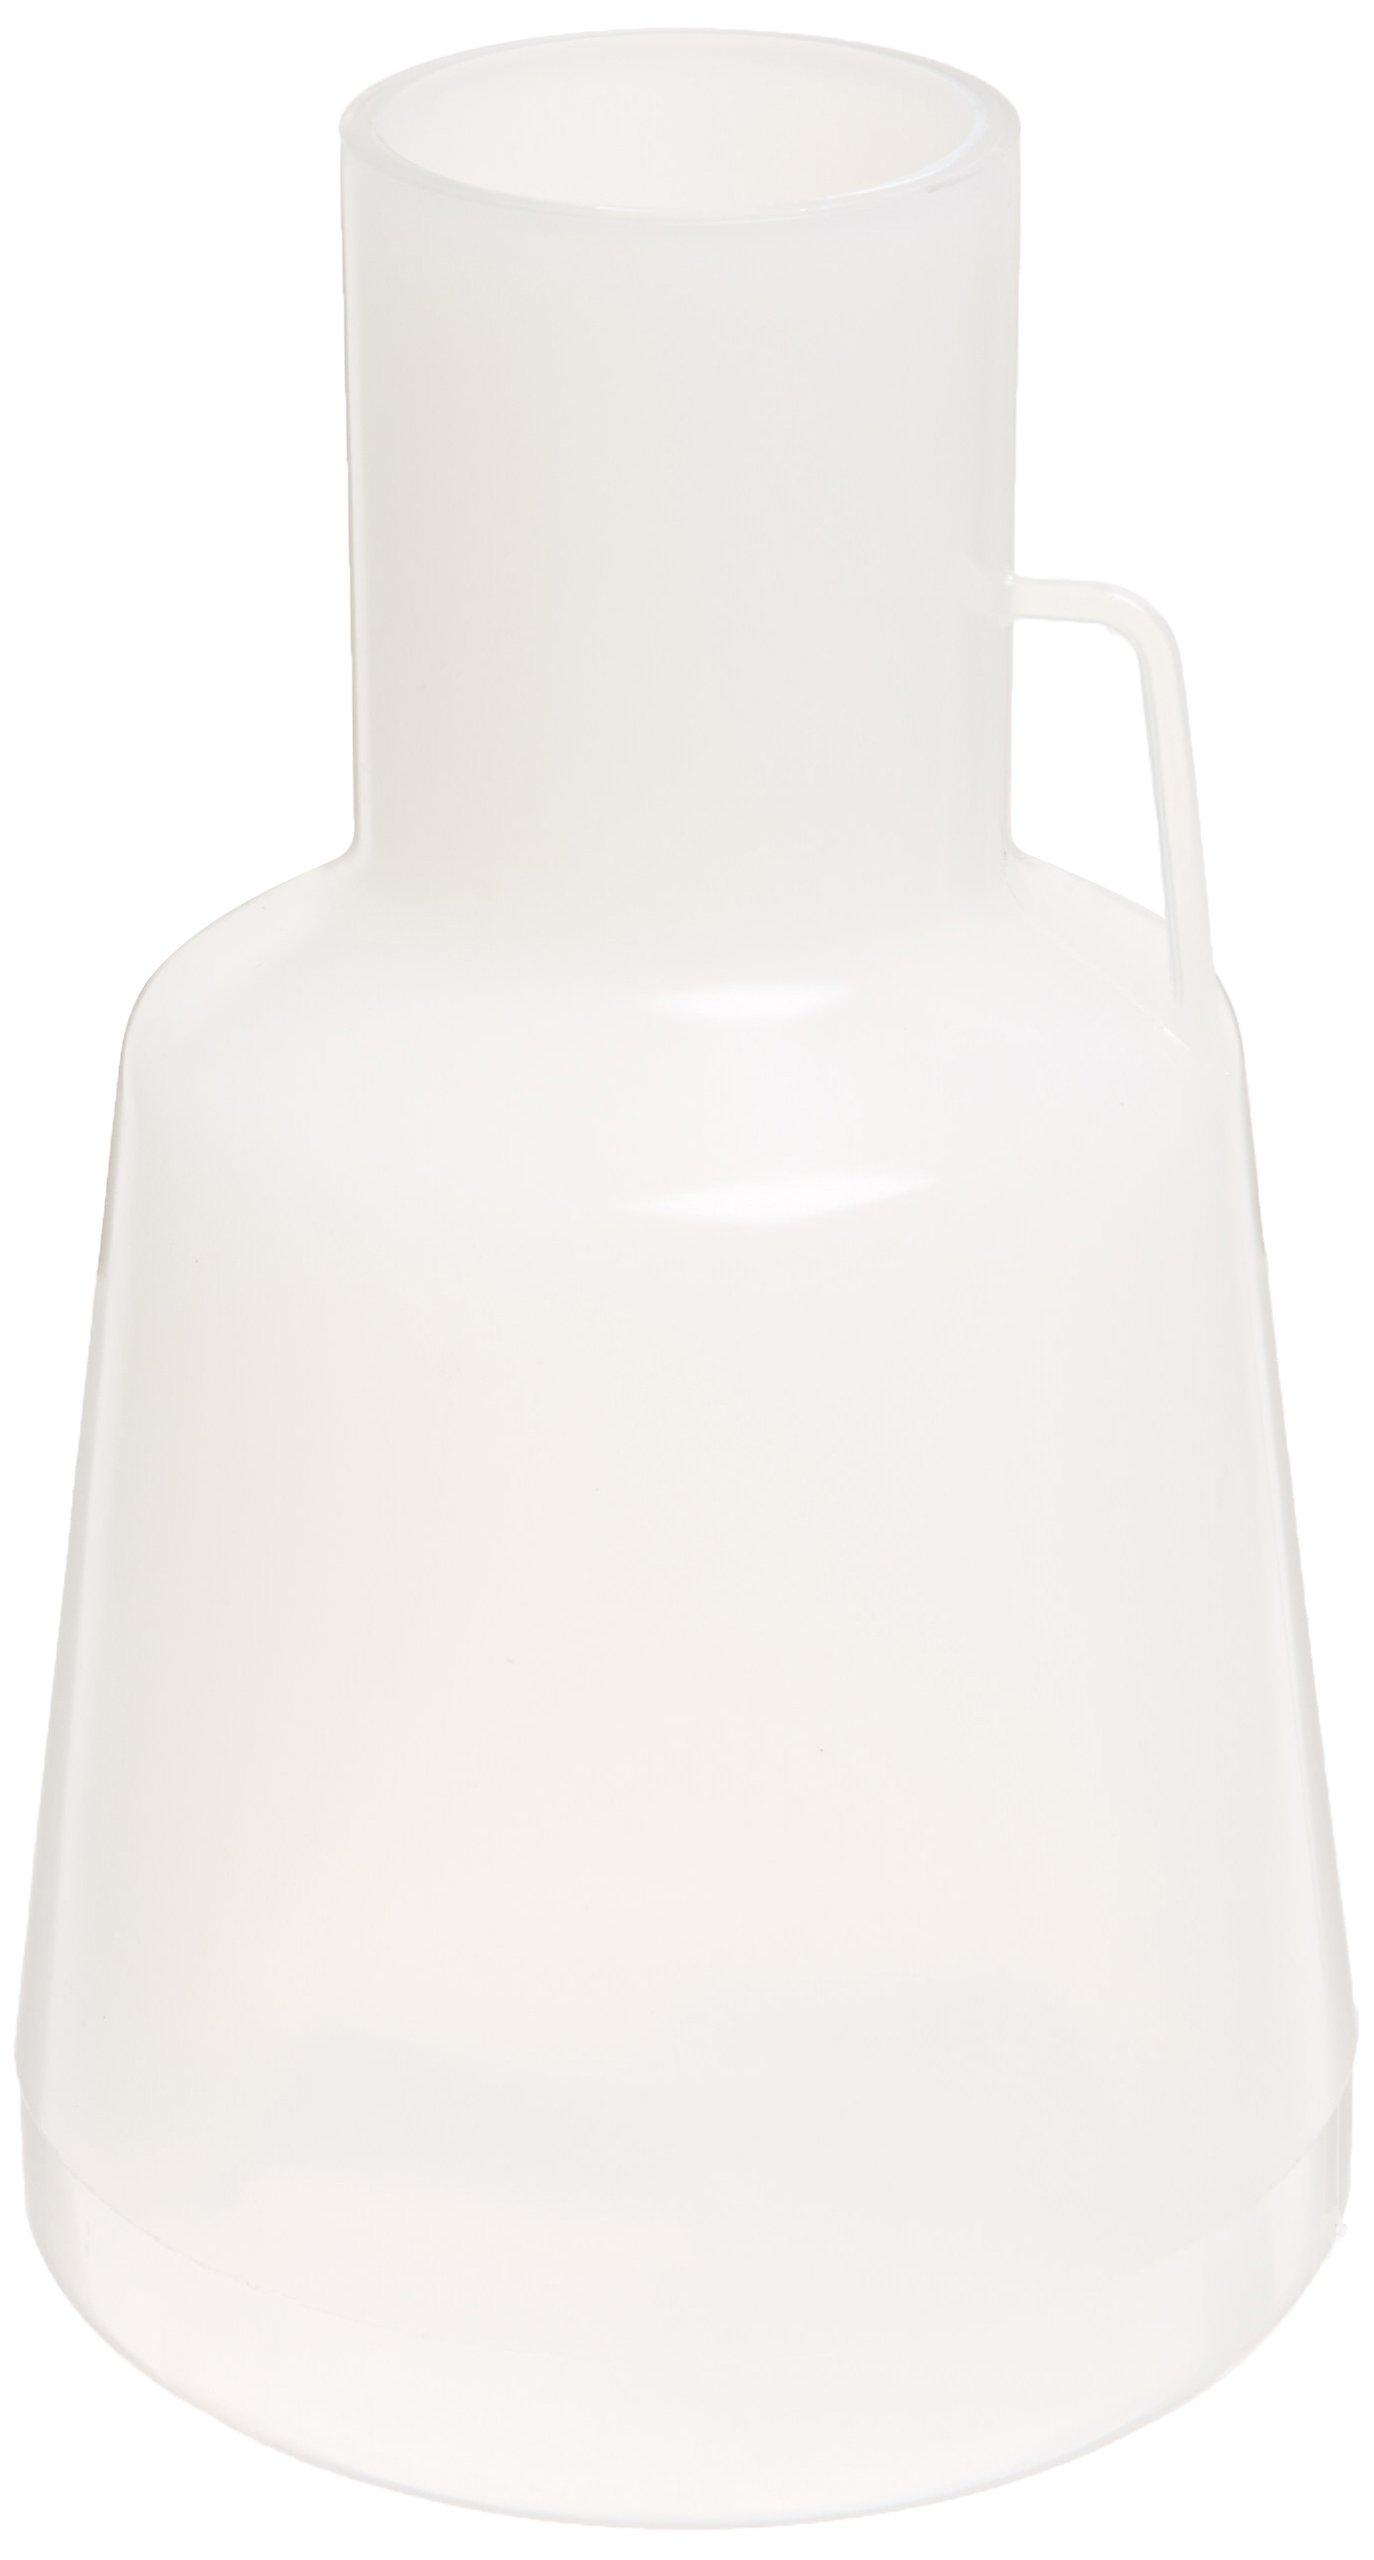 IBI Scientific SS-5012 Half-Baffle Tunair Shake Flask, 2.5L Capacity